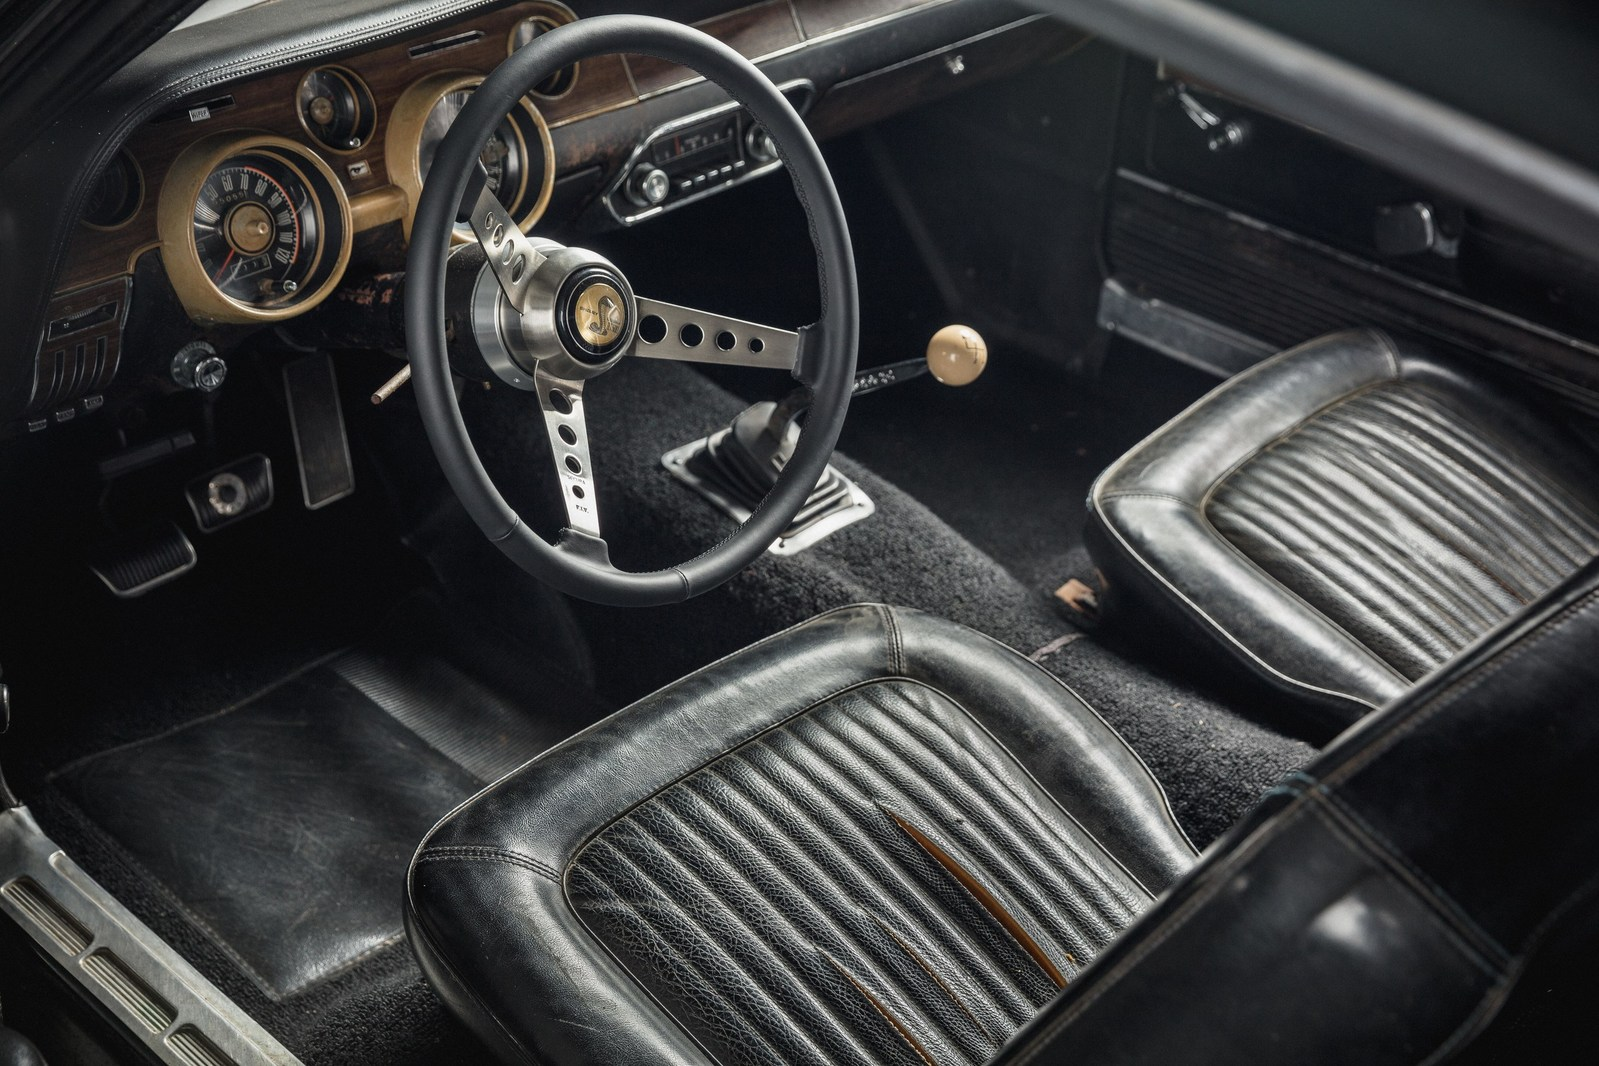 Original 1968 Mustang '559's interior. Courtesy of HVA, Casey Maxon